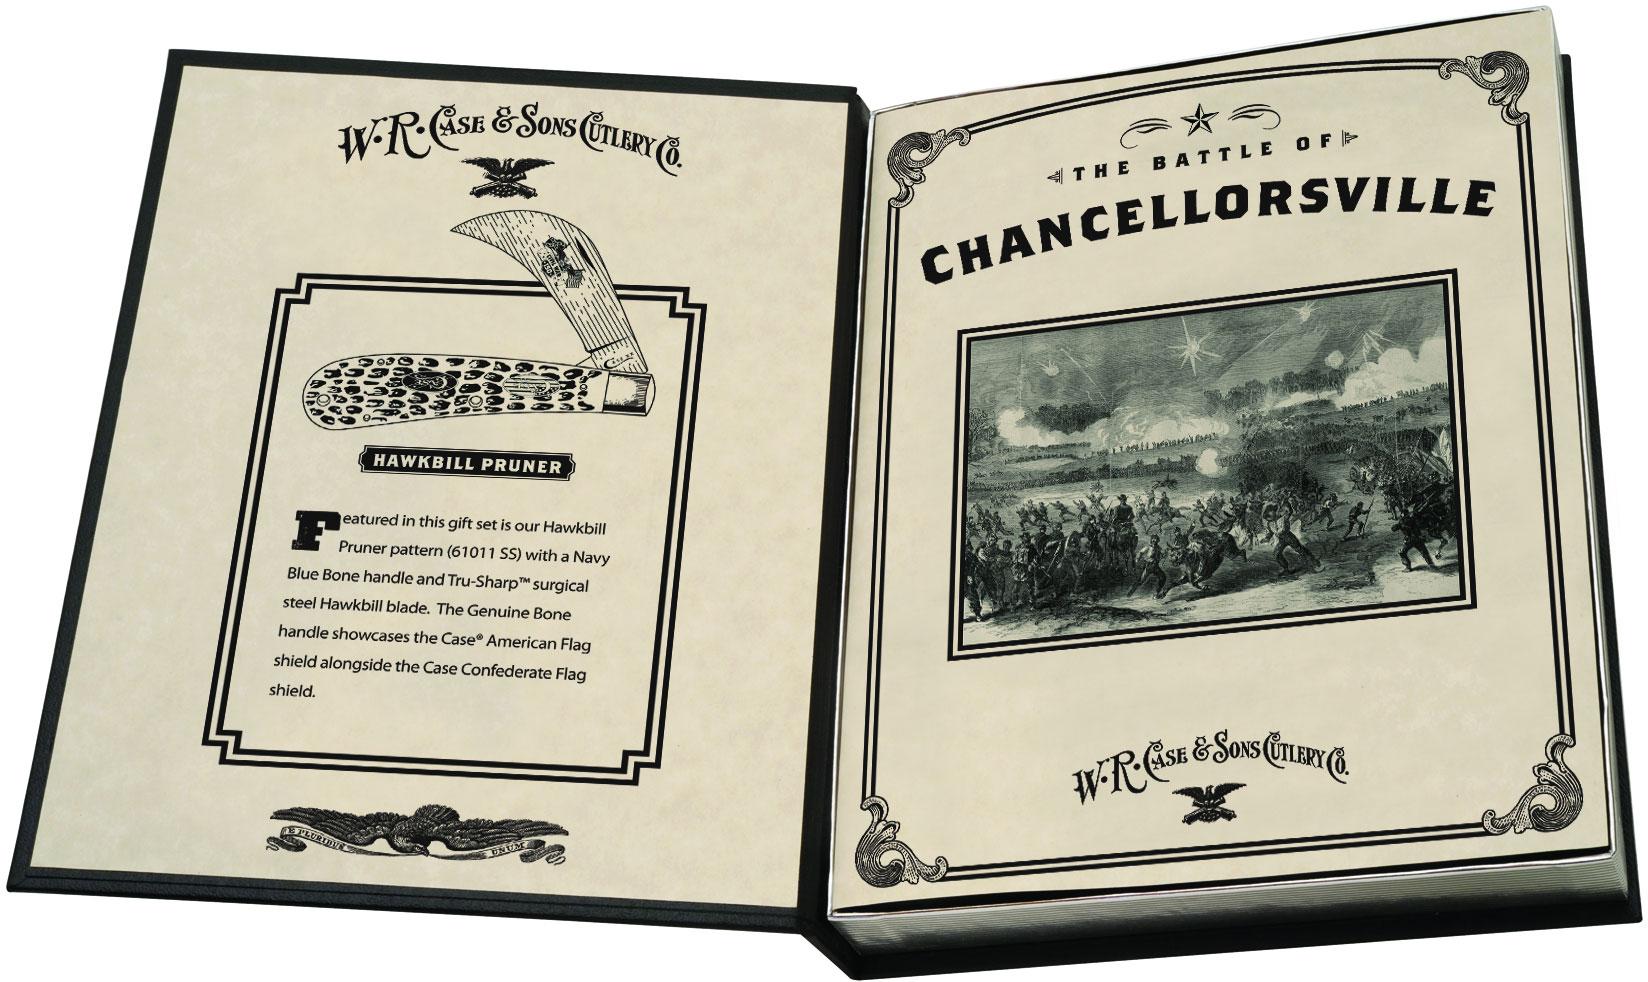 Case Civil War Commemoratives Hawkbill Pruner Battle of